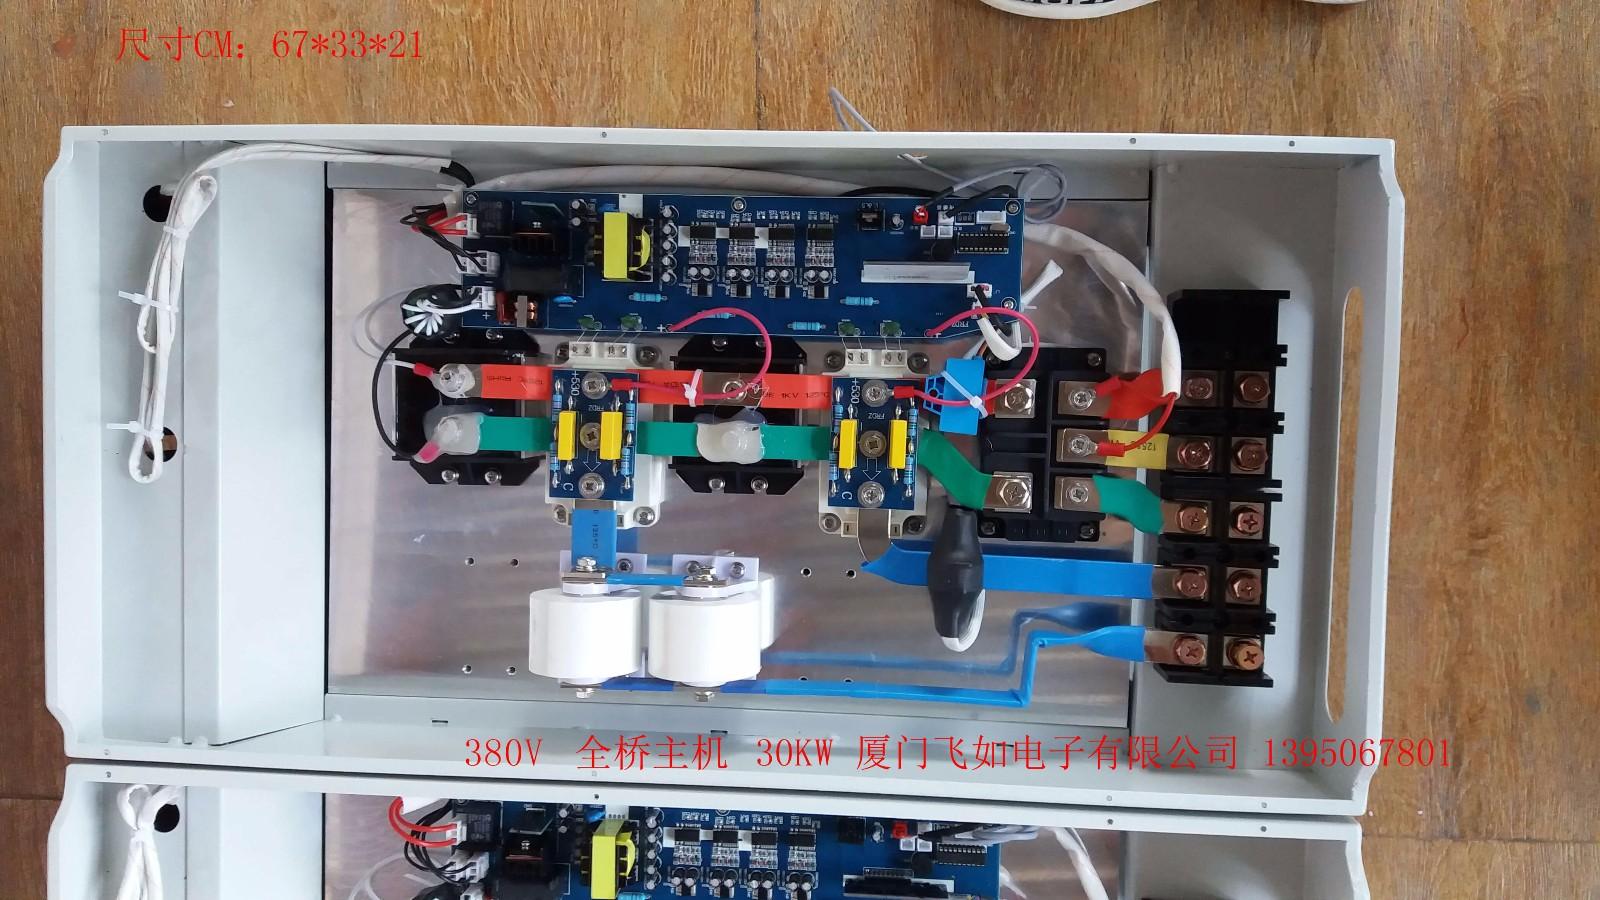 380V 20KW 电磁加热主机